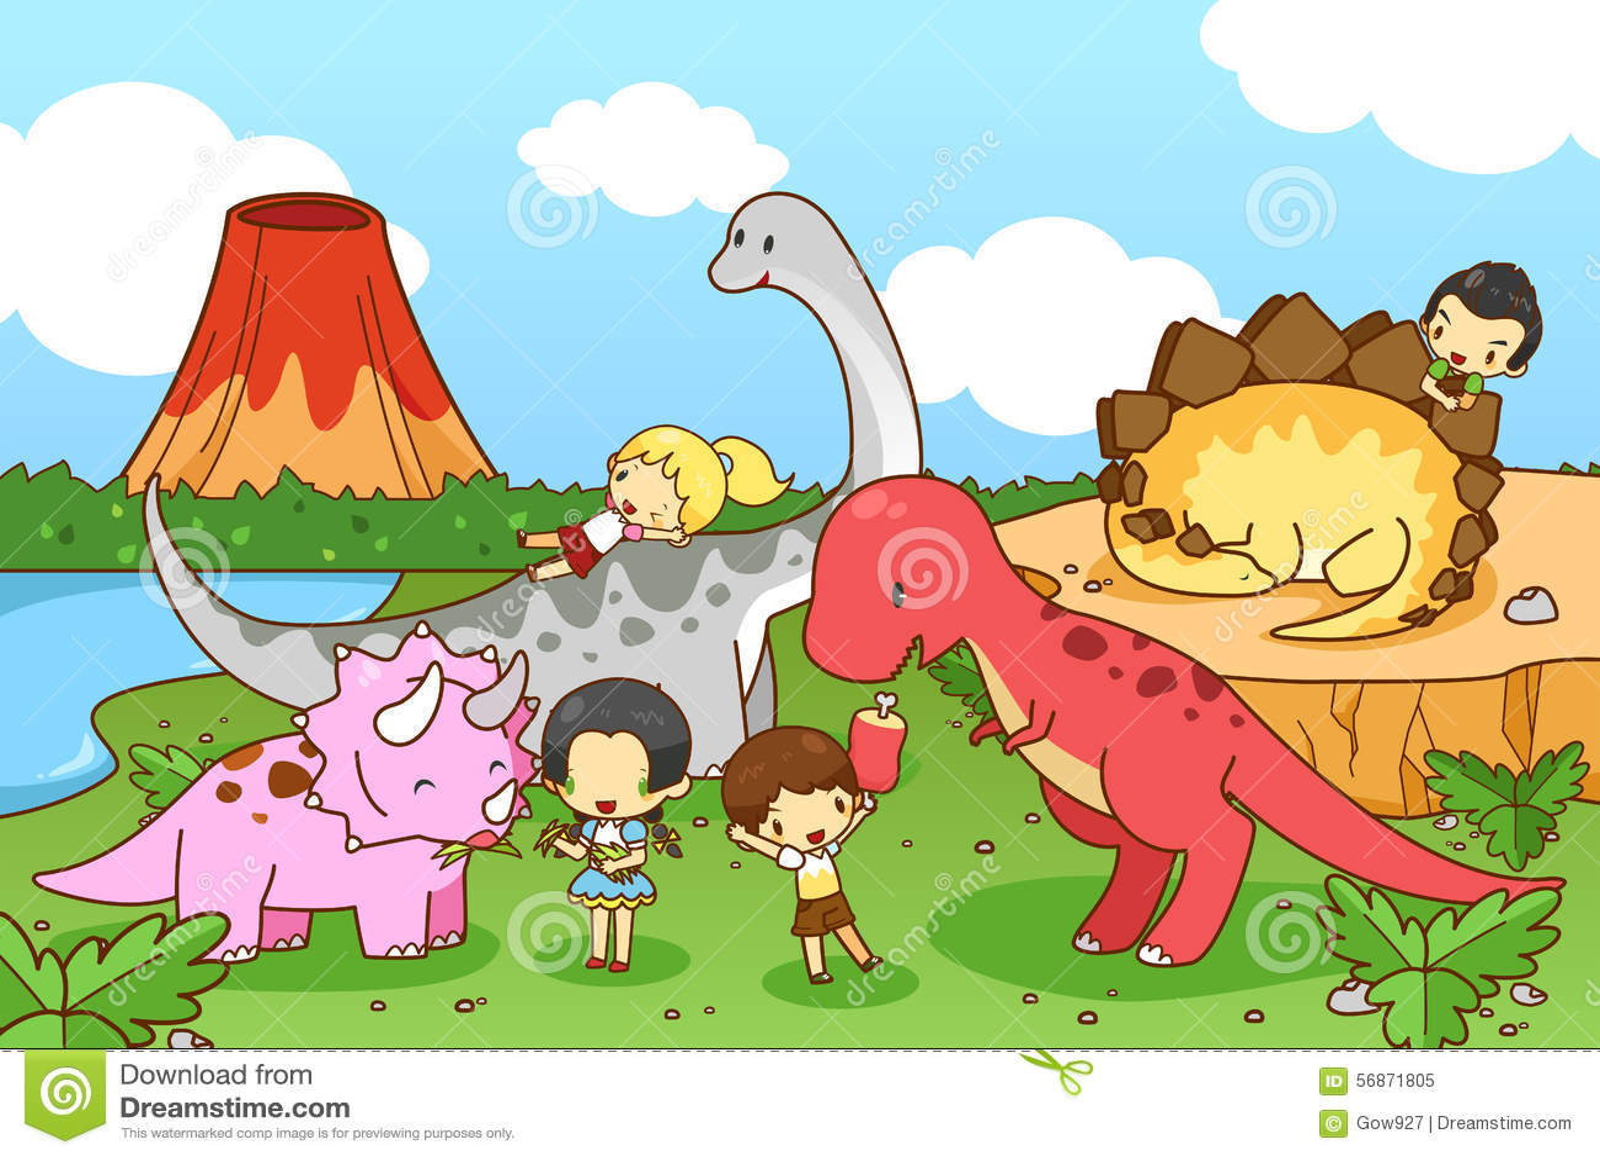 Cartoon Dinosaur World Of Imagination With Kids And Children Pla Stock